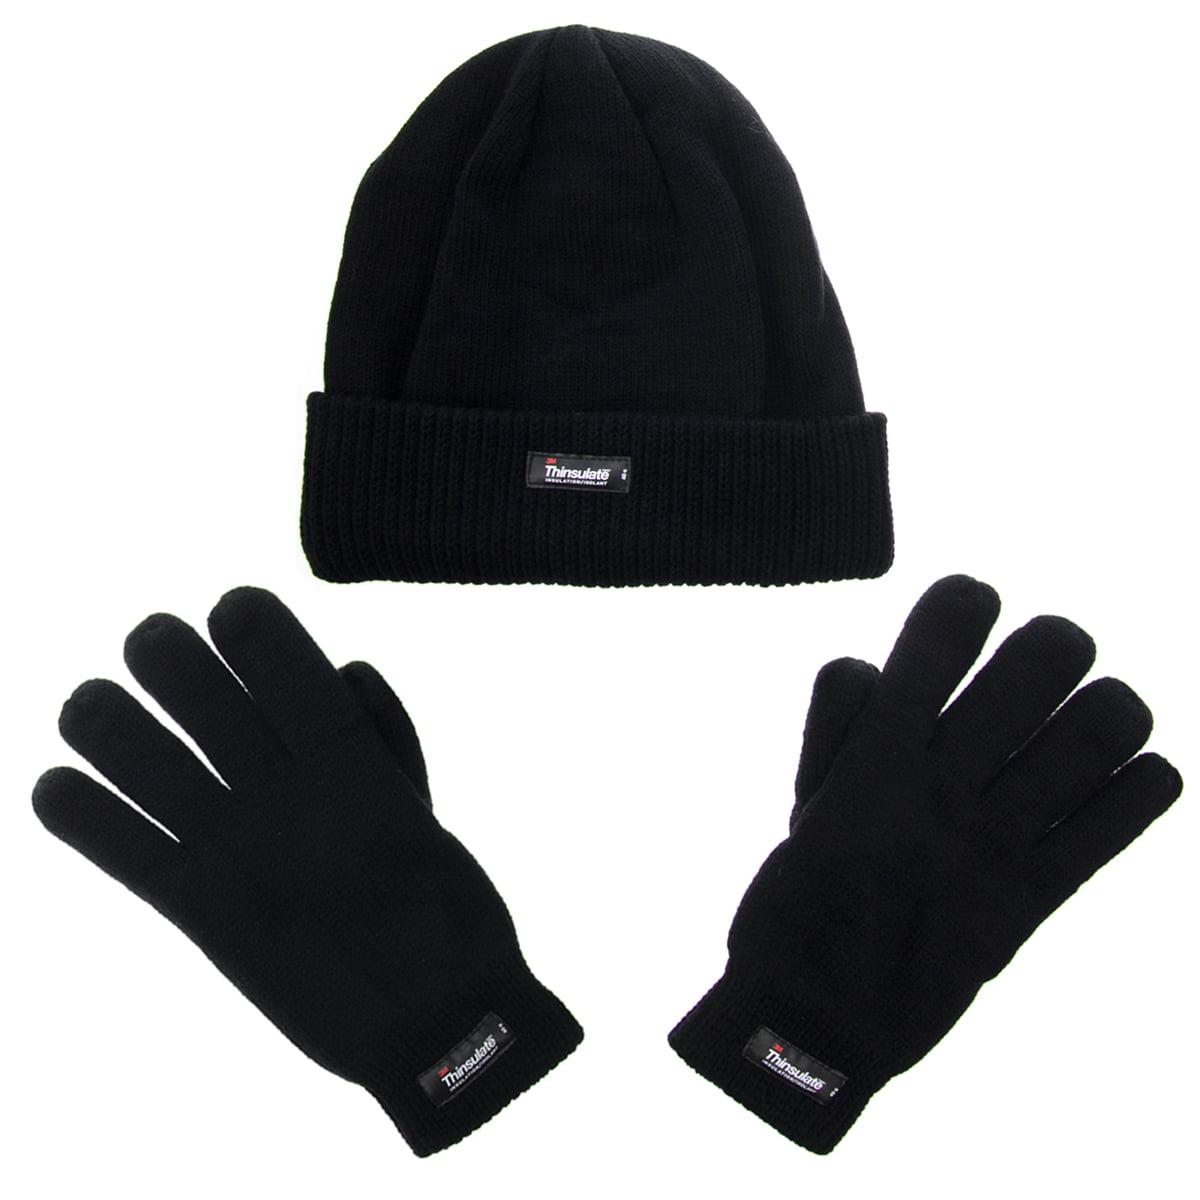 99f75d3c503a1 3M - 3M Men s Thinsulate 40g Black Beanie Hat   Gloves Fleece Lining For Winter  Snow Cold Weather Gear - Walmart.com